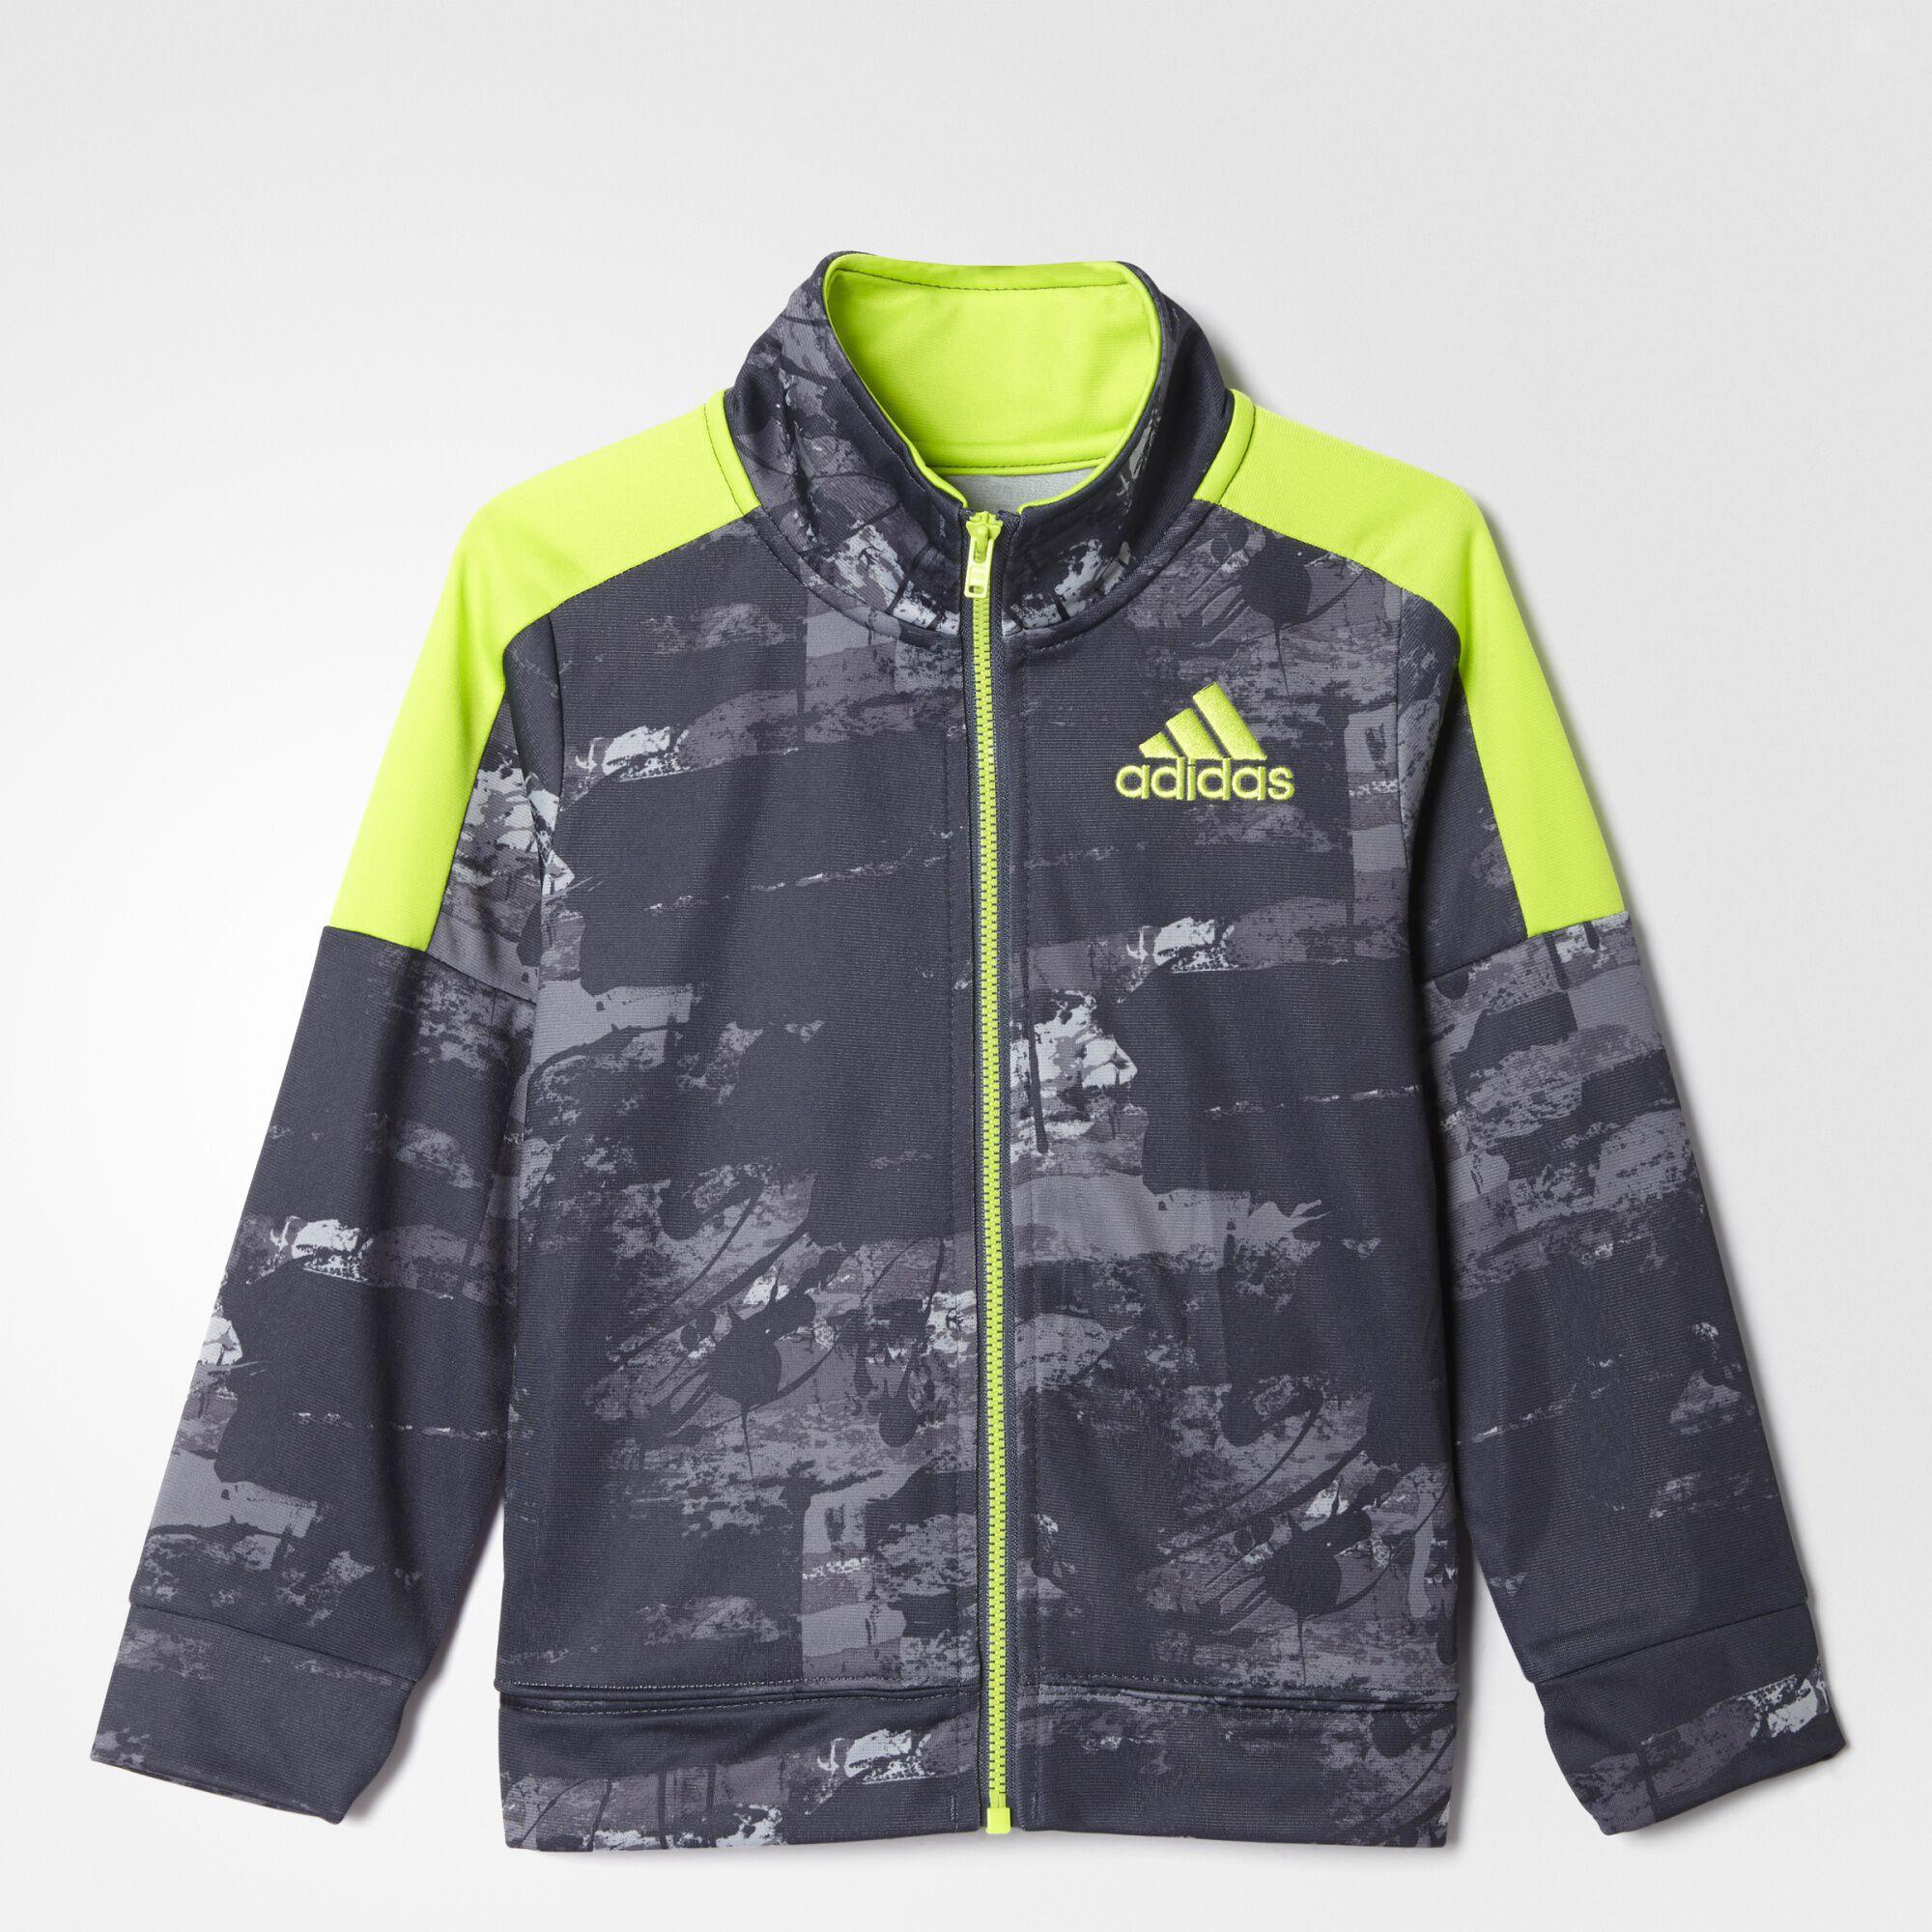 Buy Adidas Star Wars Hoodie Mens Yellow Cheap